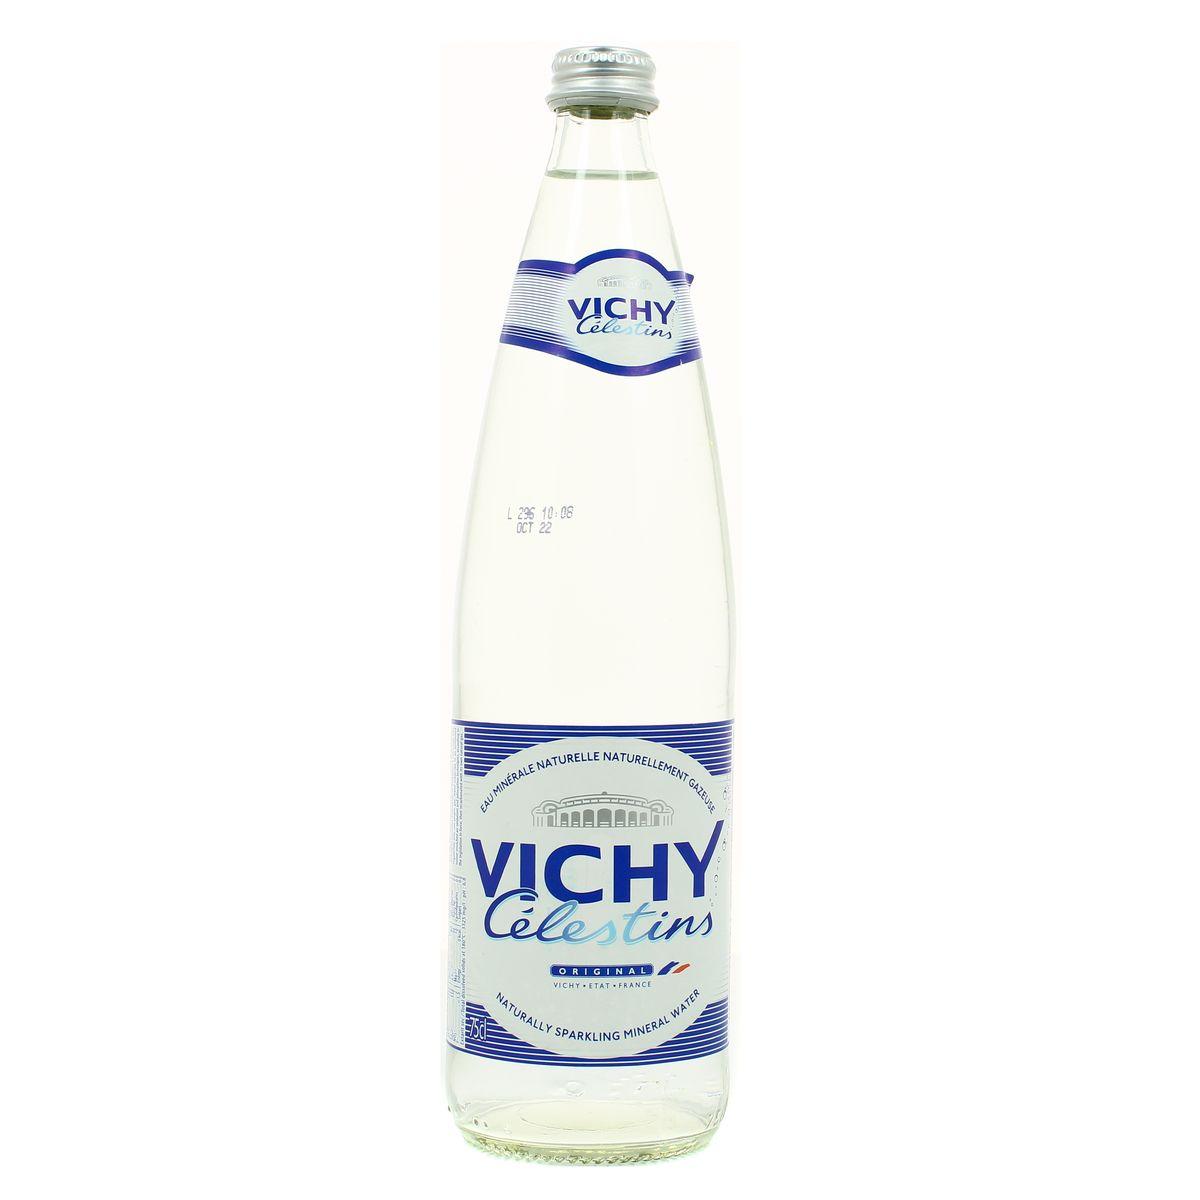 Sodastream Vichy